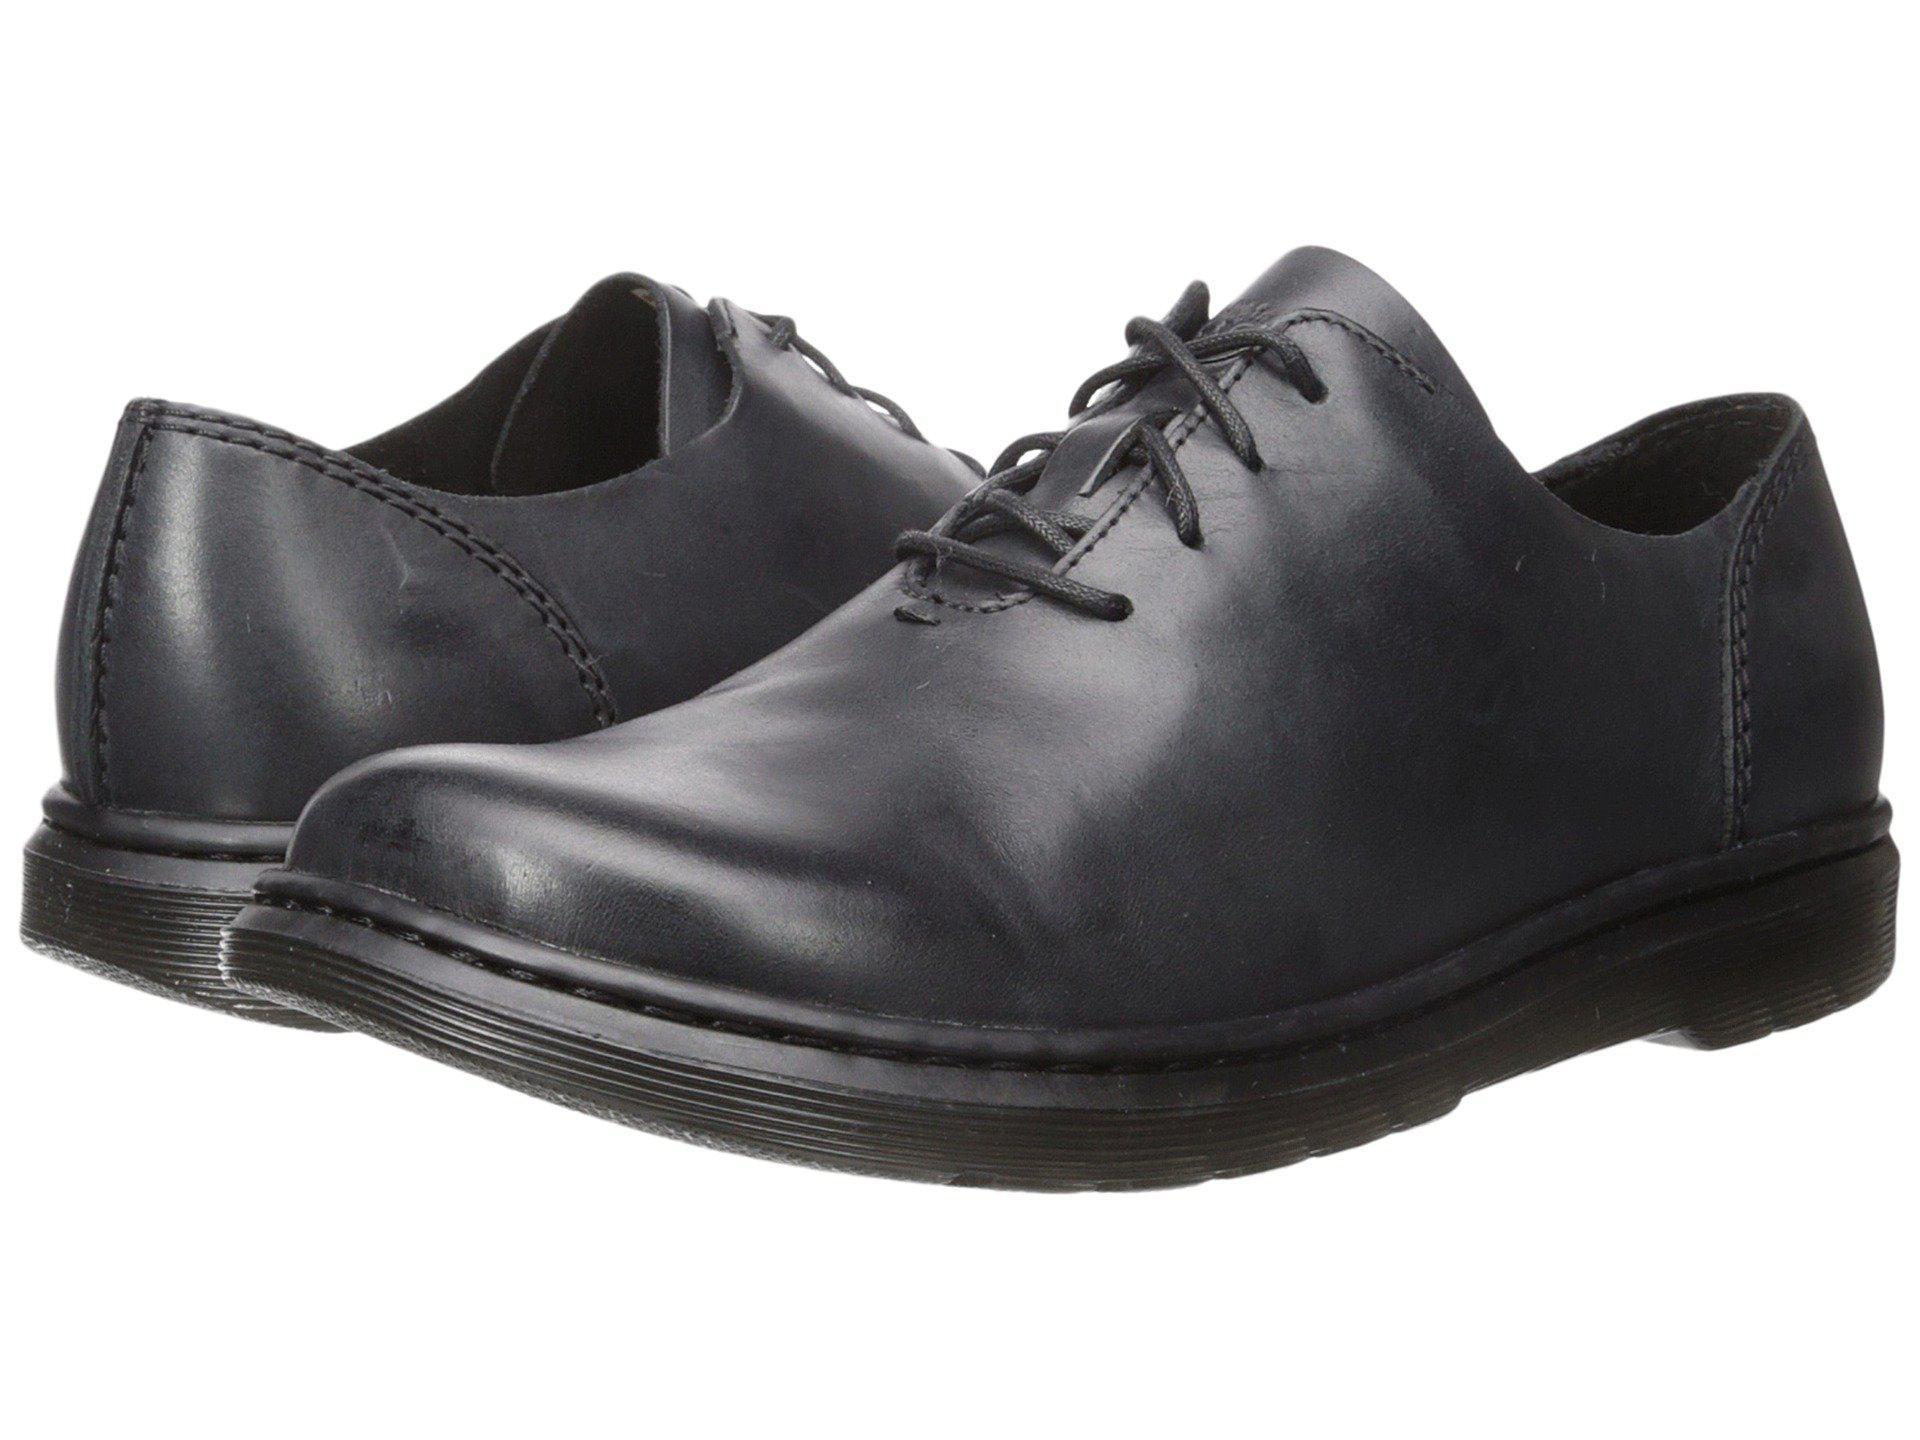 Lorrie III Lace Shoe X2 Insoles Dr. Martens xL9XNlG